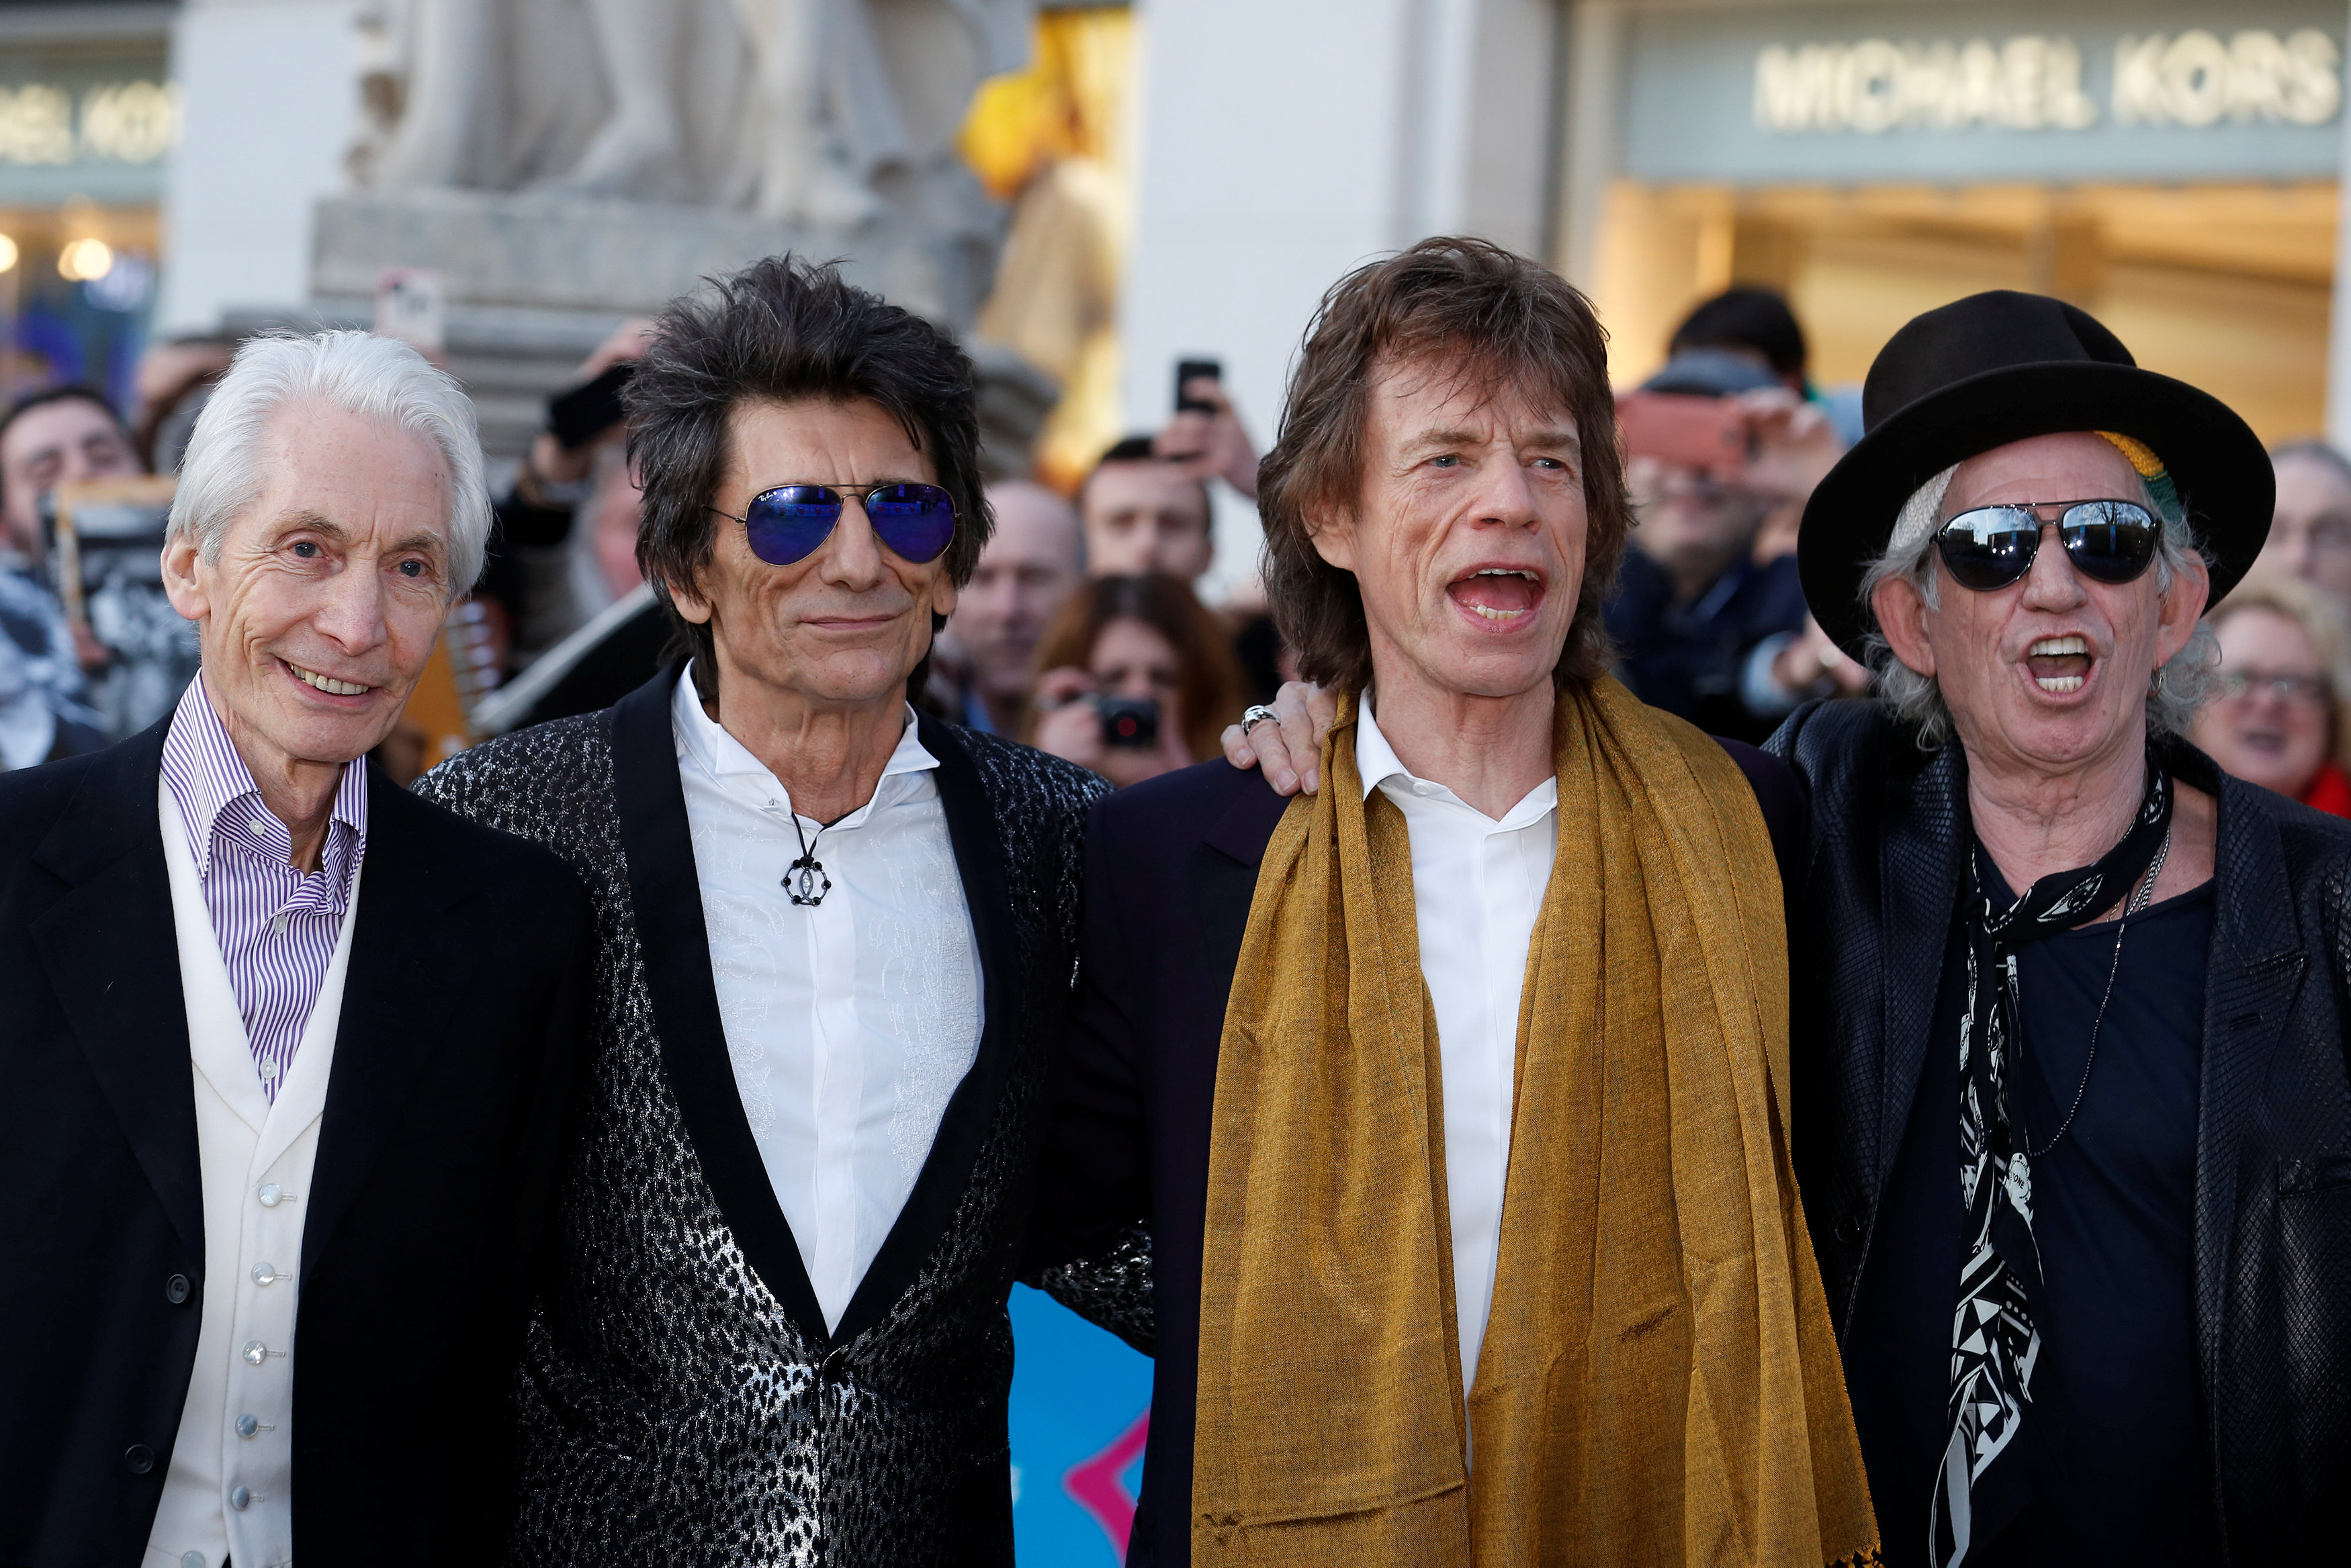 Rolling Stones Saatchi 2016 10 06T124047Z 743053100 D1AEUFKJLNAA RTRMADP 3 MUSIC ROLLINGSTONES